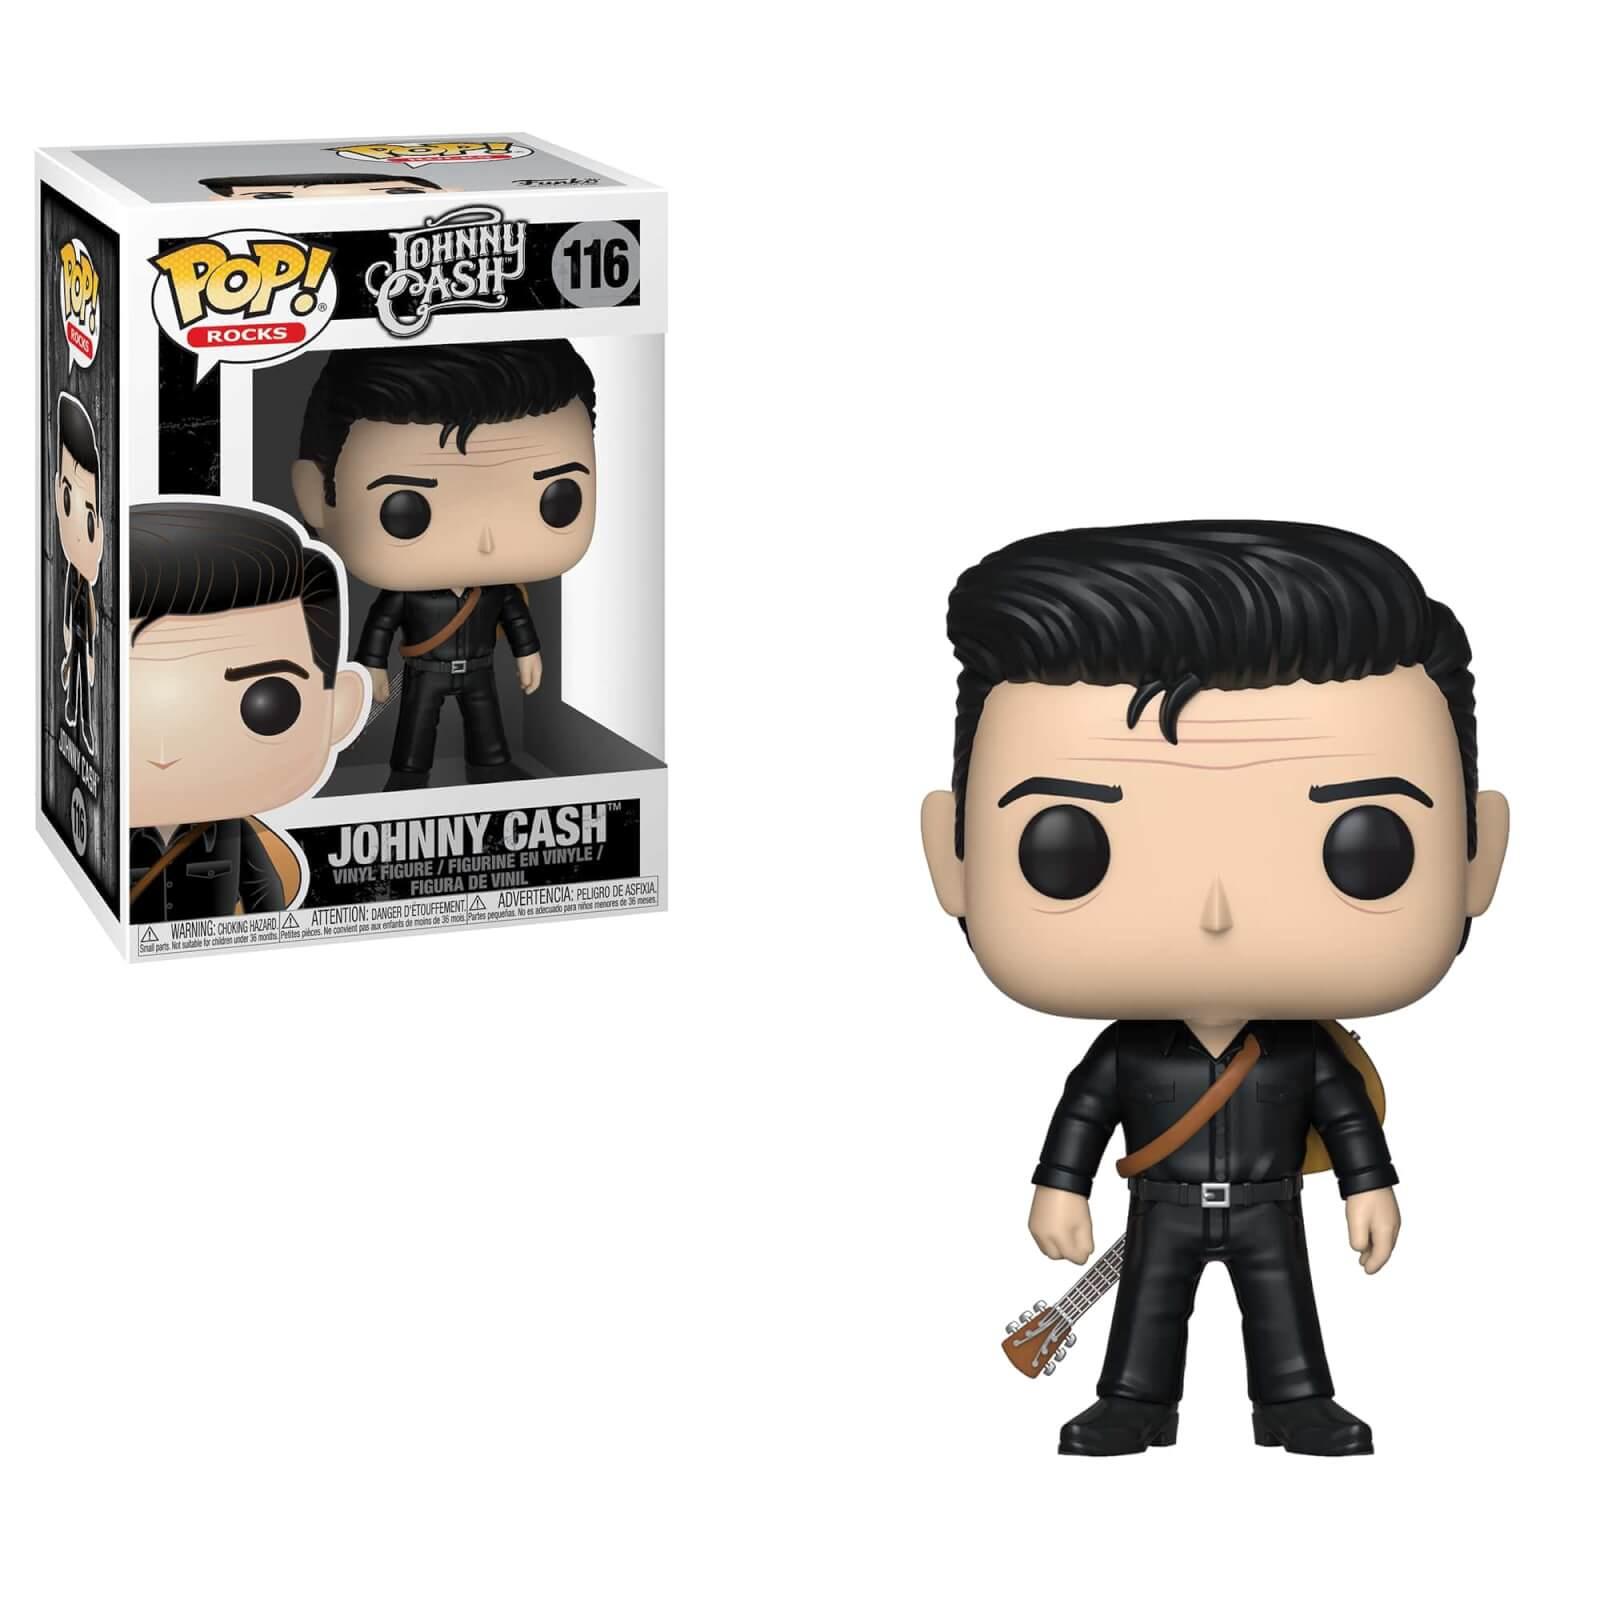 Vinyl--Johnny Cash Pop Vinyl Johnny Cash Pop